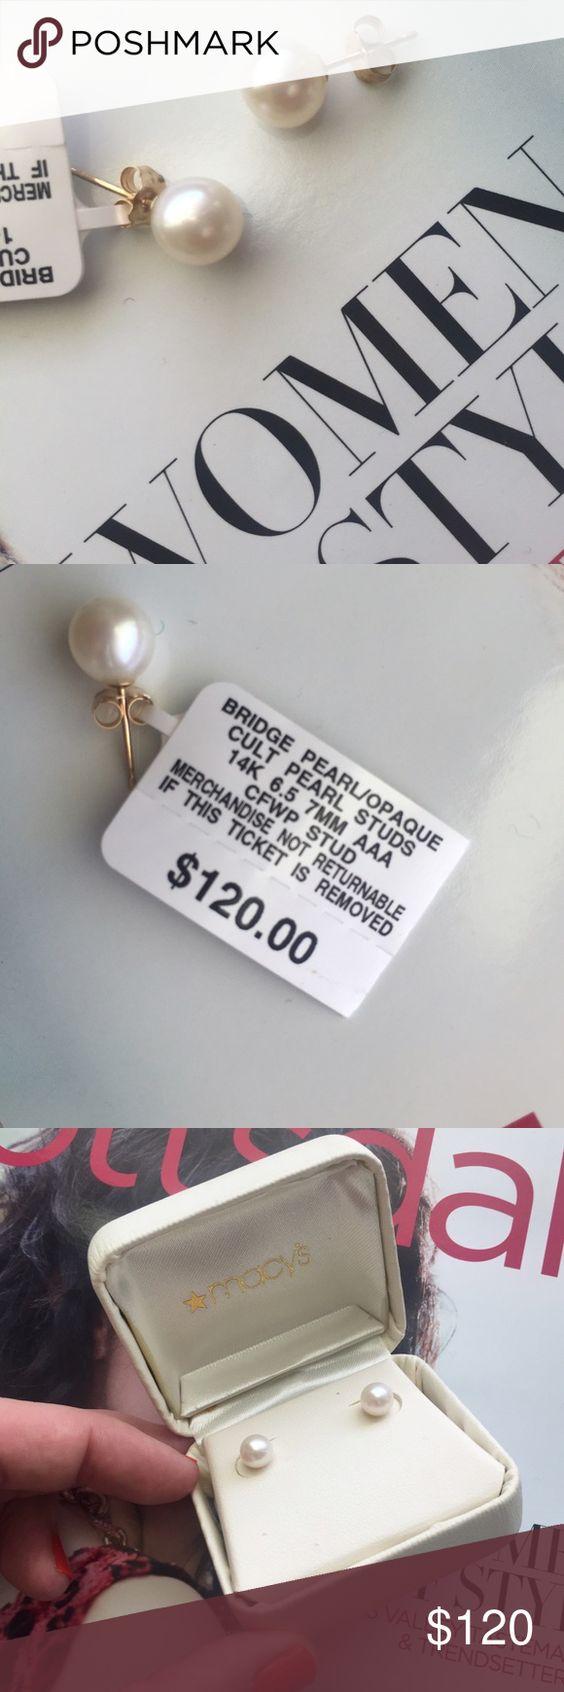 New Listing✨ 🆕 Macy's Pearl Earrings Nwt Macy's Cultured Pearl Earrings  With 14k Gold